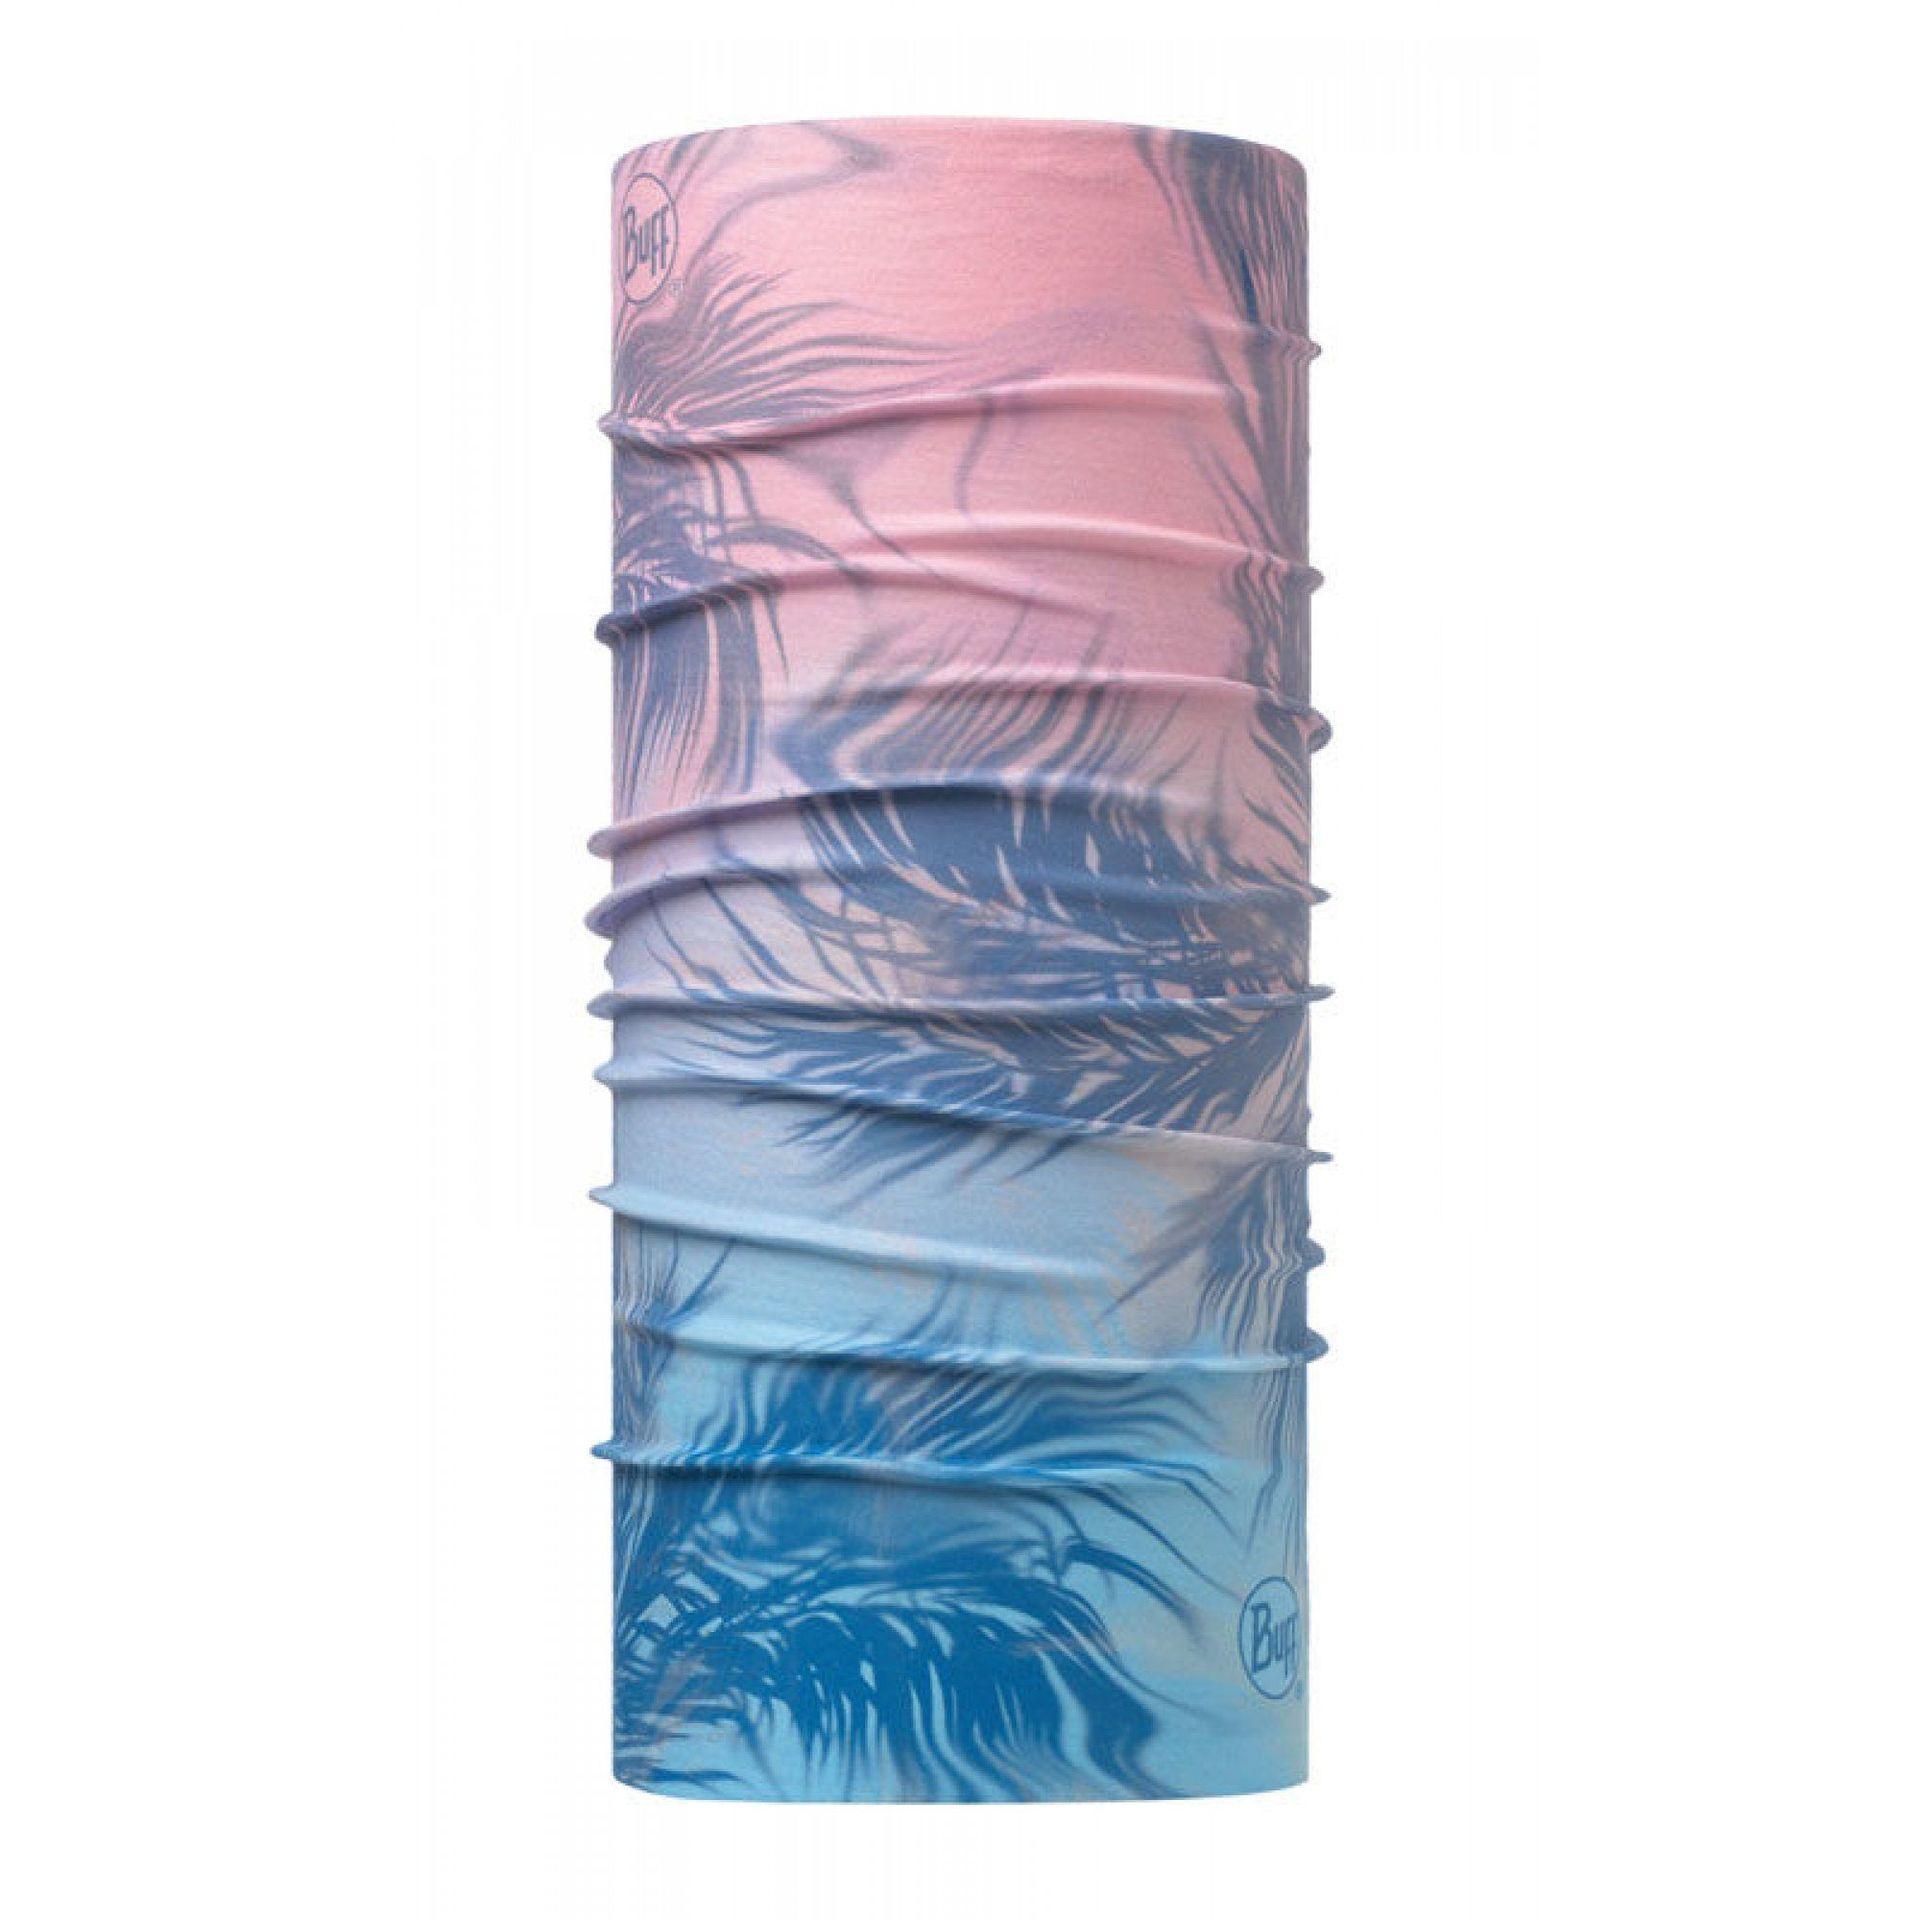 CHUSTA BUFF HIGH UV PROTECTION MAGNUM PINK